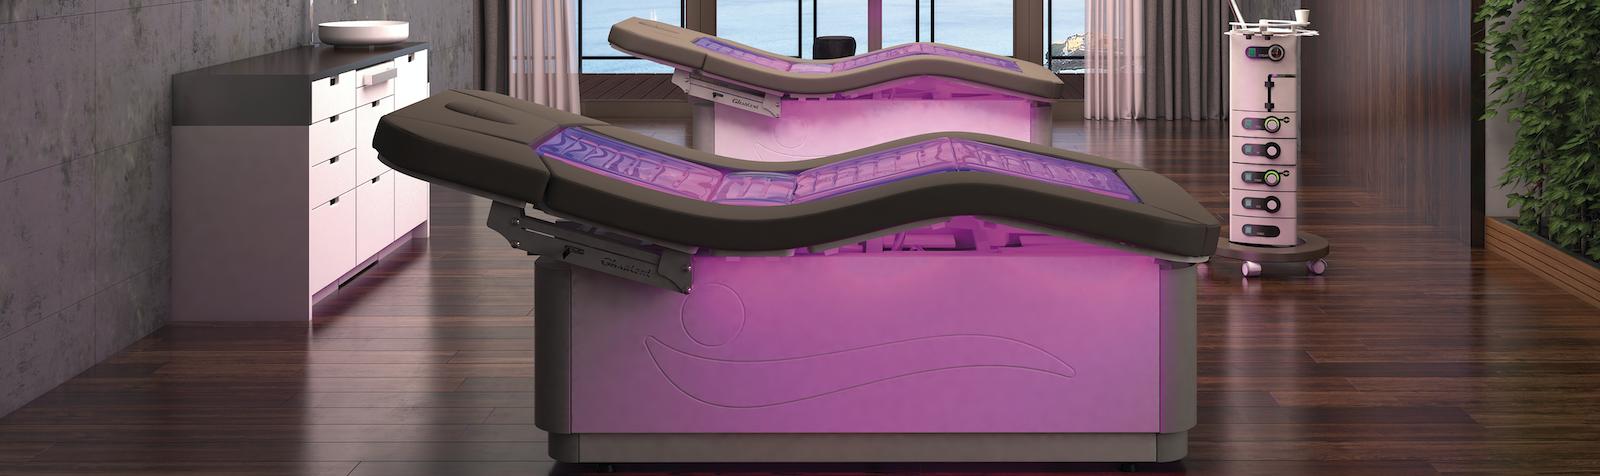 hottub virivky jacuzzi sauny swimspa maserska postel